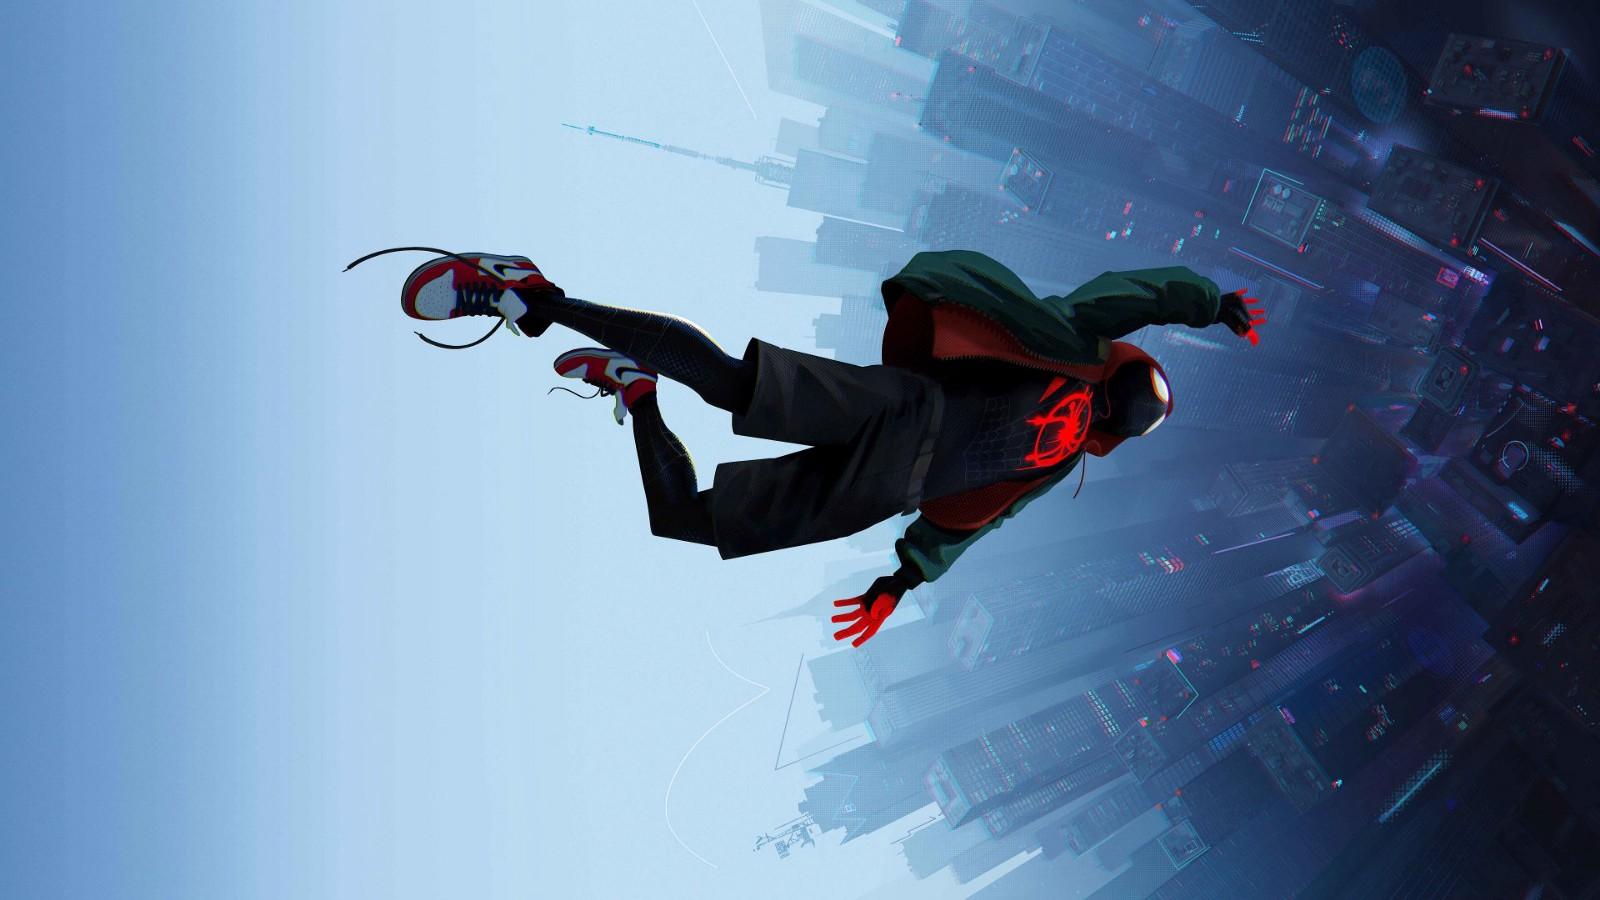 Air Jordan Retro High og origin story Spider Man | Collater.al